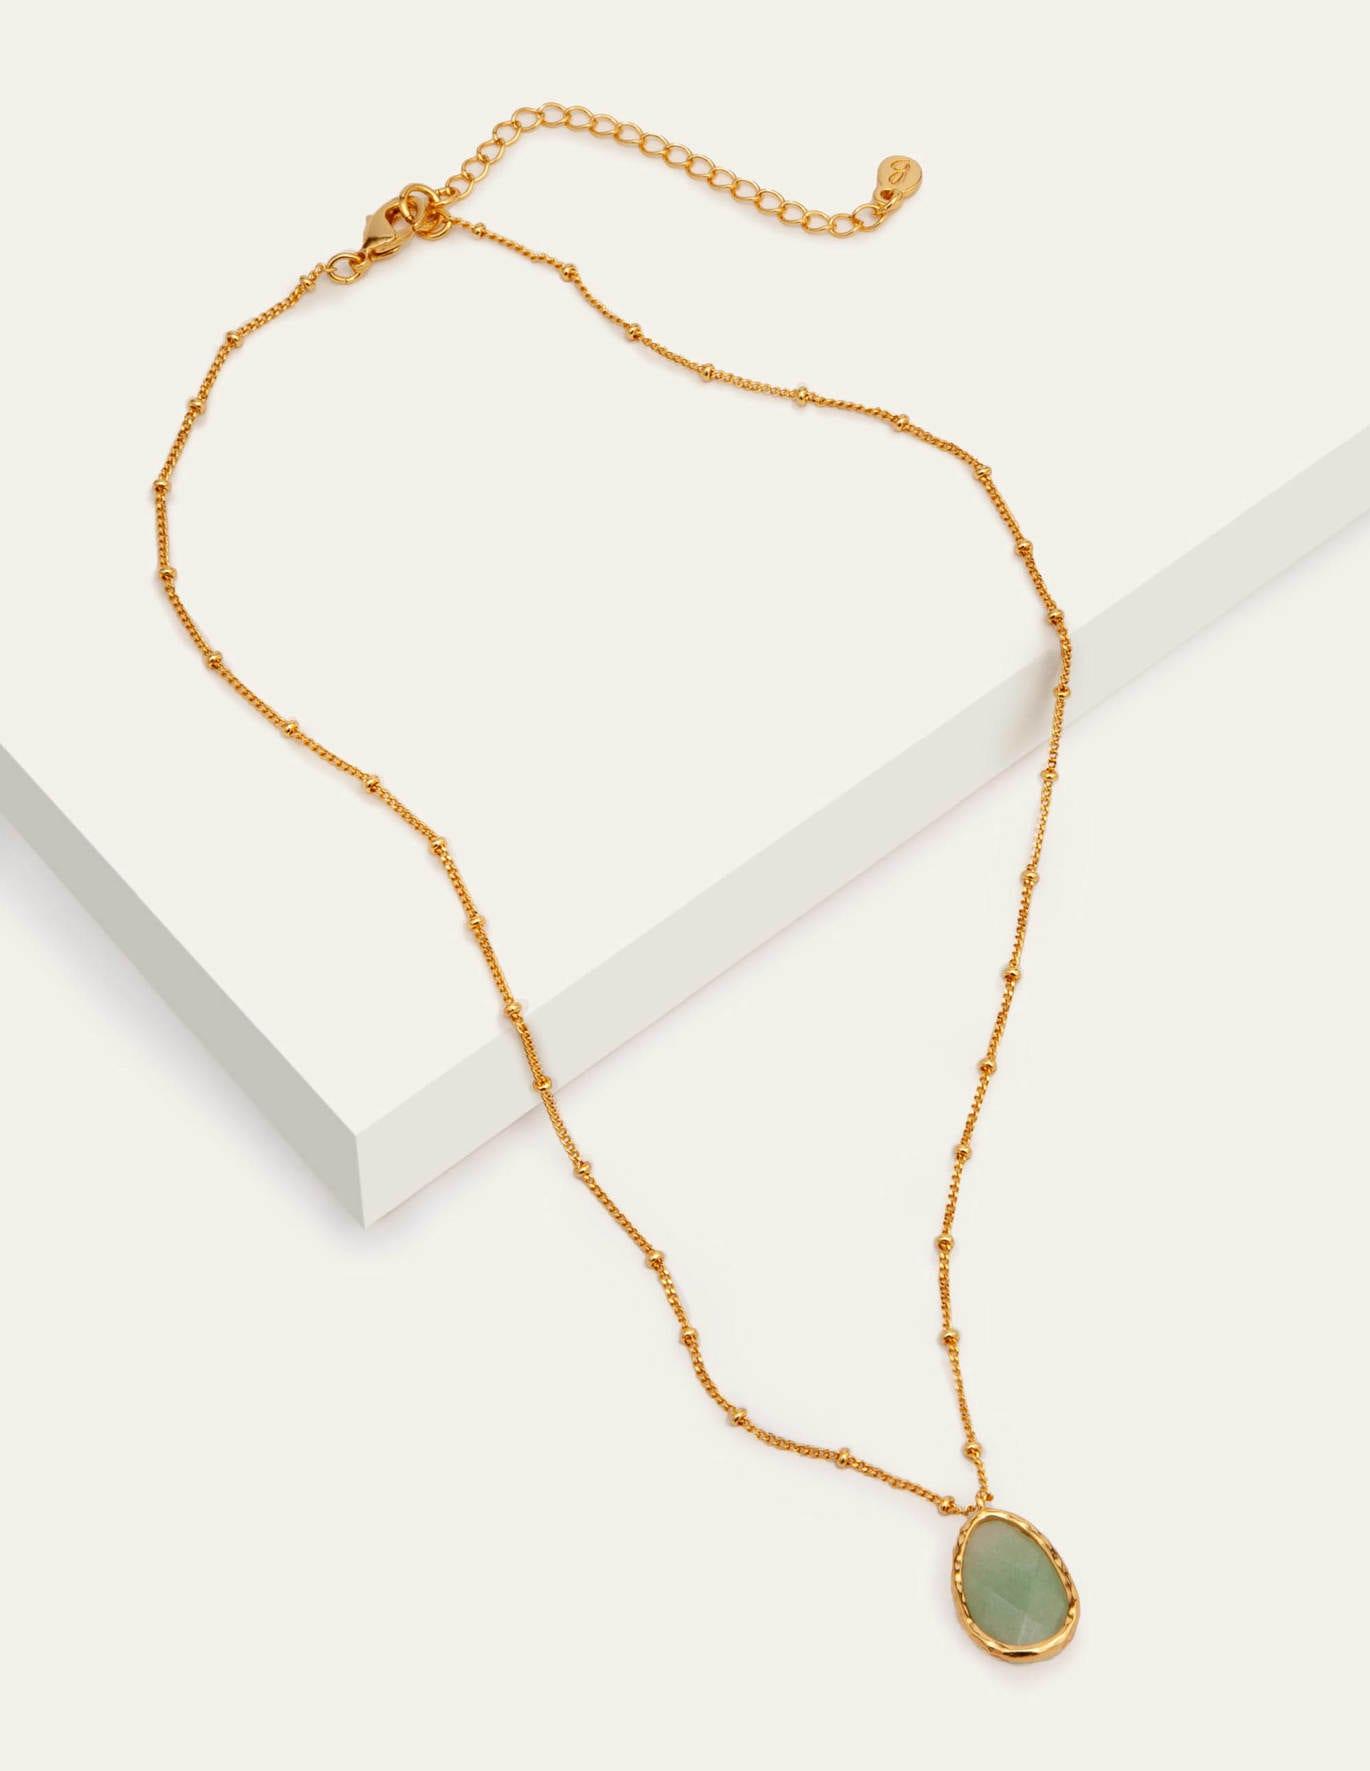 Green Agate Pendant Oval Pendant Blue Dragon Veins Yellow Gemstone #692 Gemstone Pendant Semi Precious Jewelry Supply